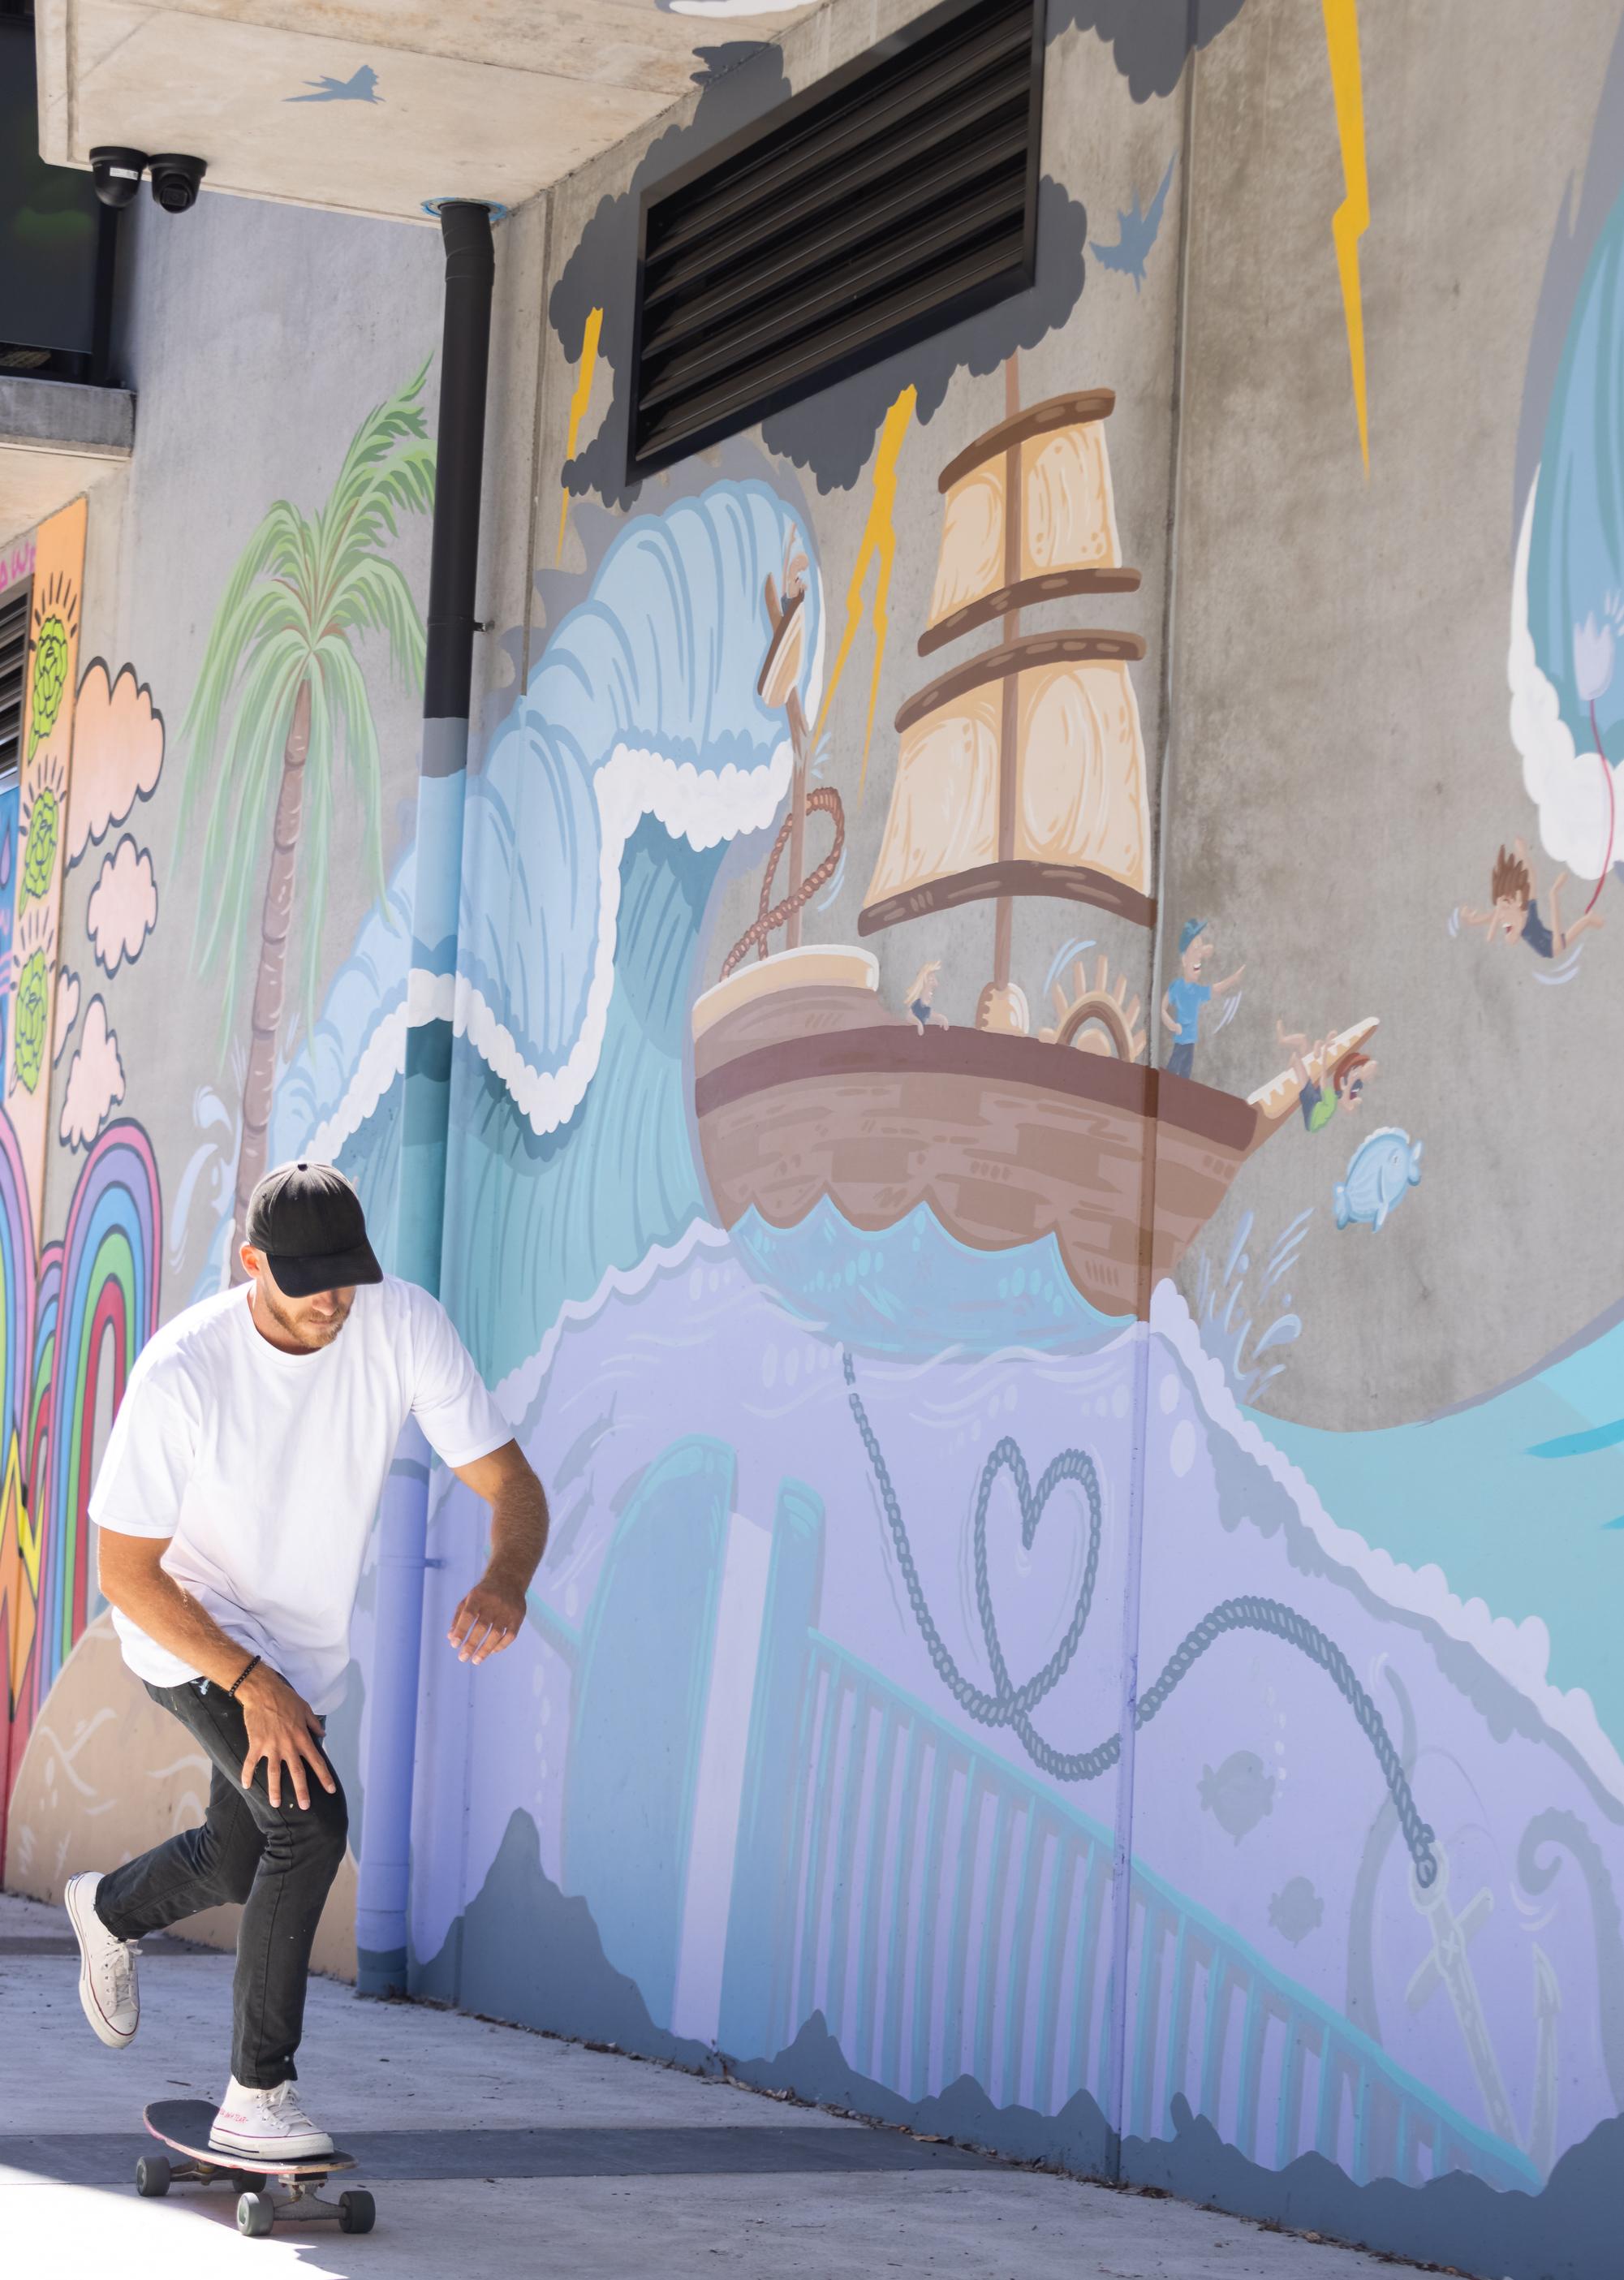 Mitch skates past a mural.